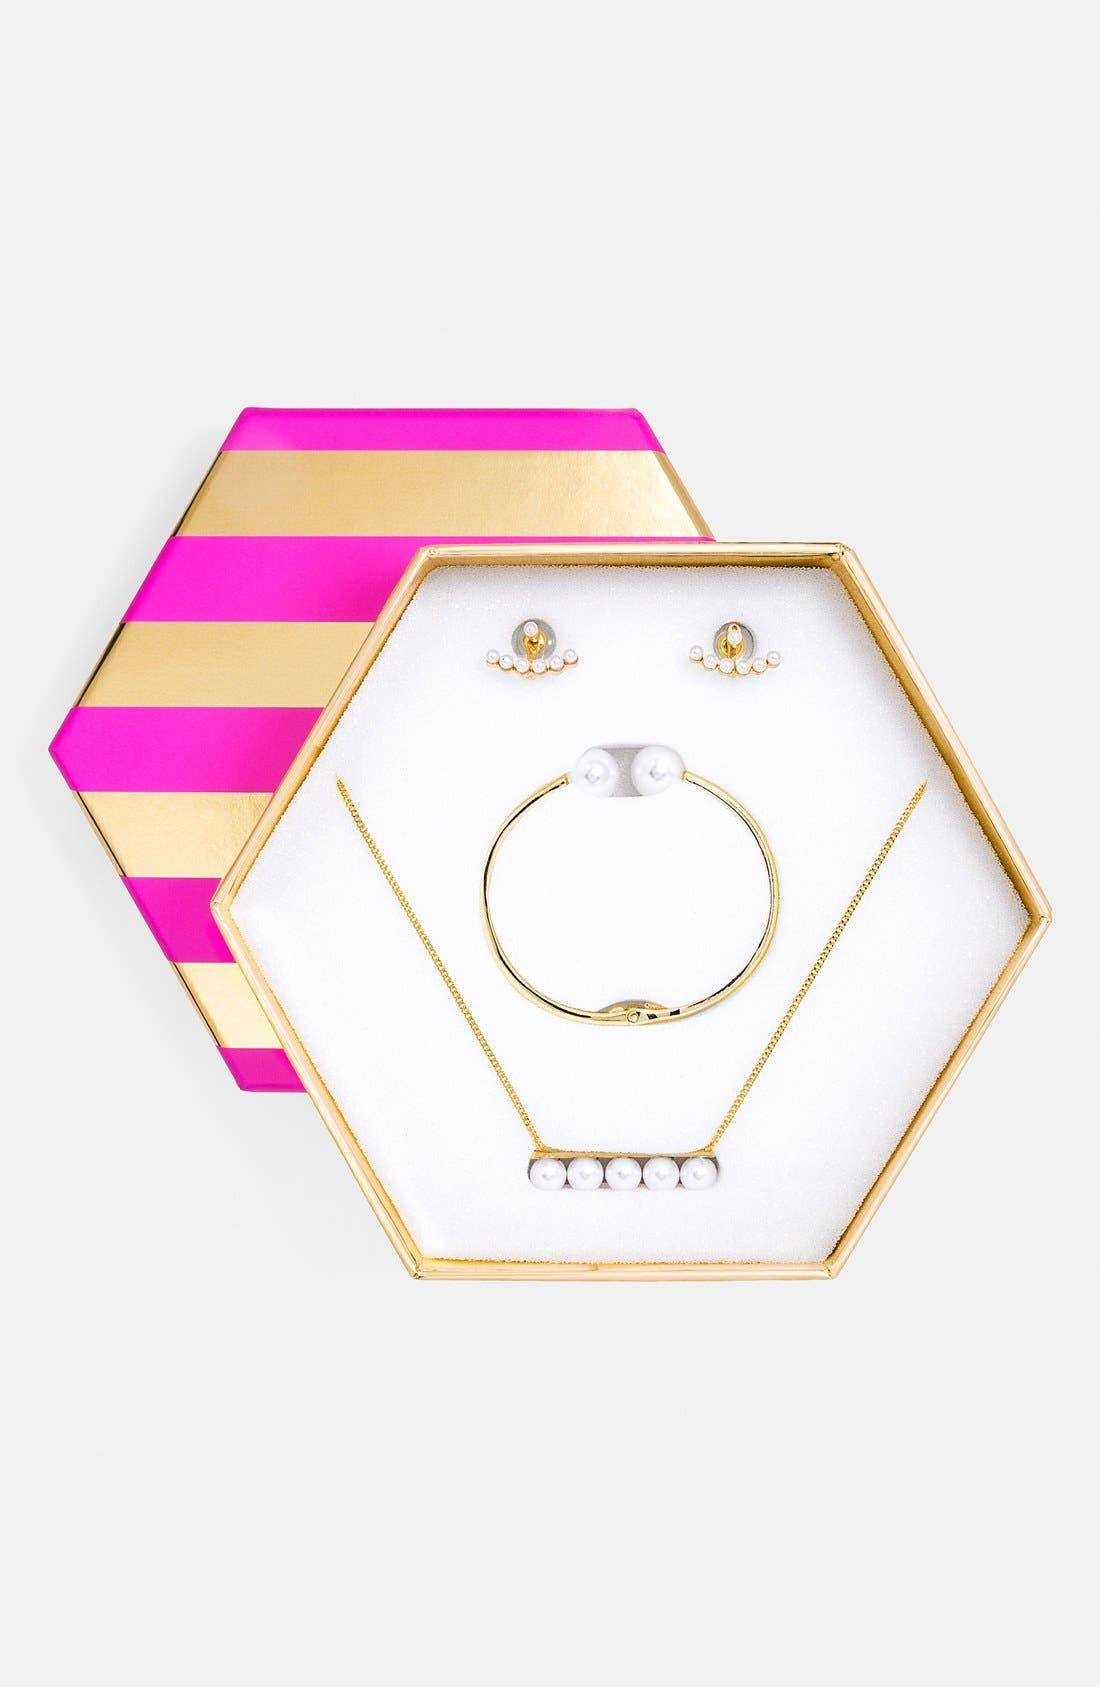 Alternate Image 1 Selected - BaubleBar 'Trending: Modern Pearly Bead' Necklace, Bracelet & Ear Jacket Gift Set